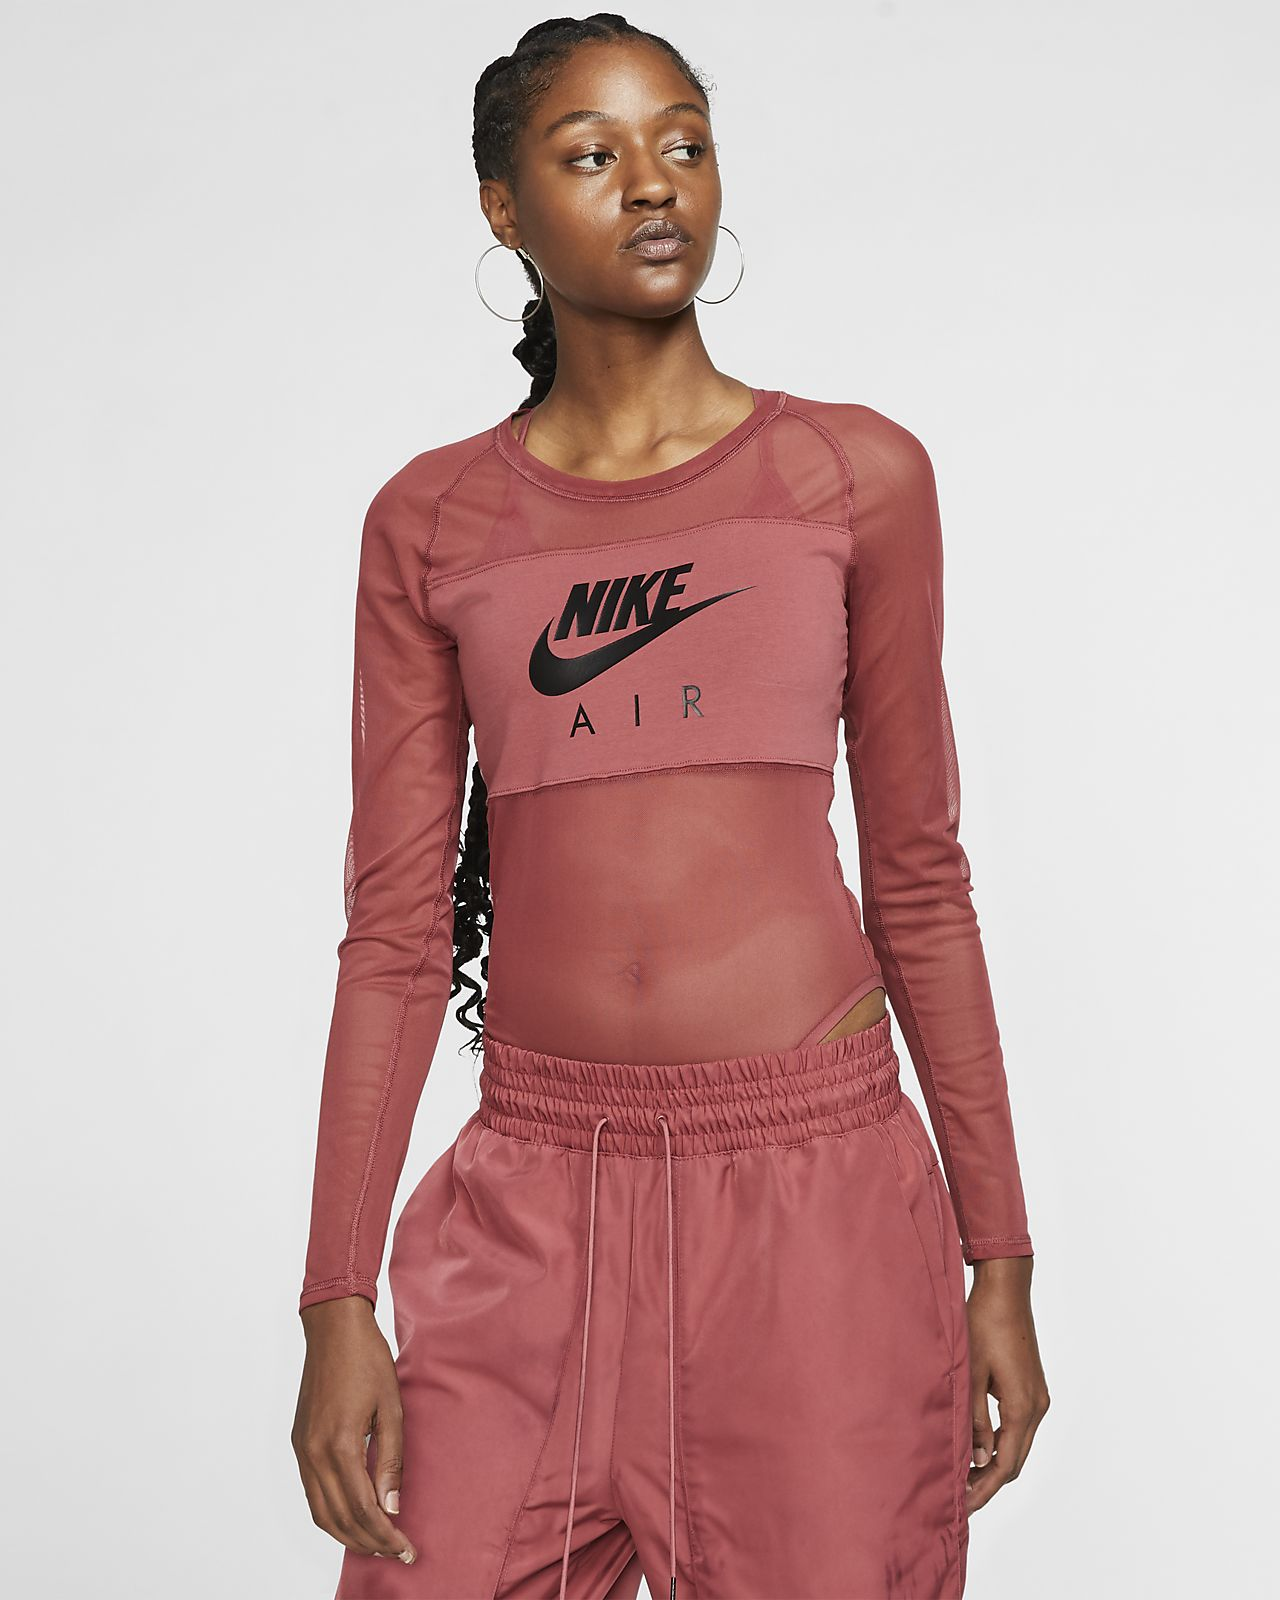 Nike Air black mesh bodysuit